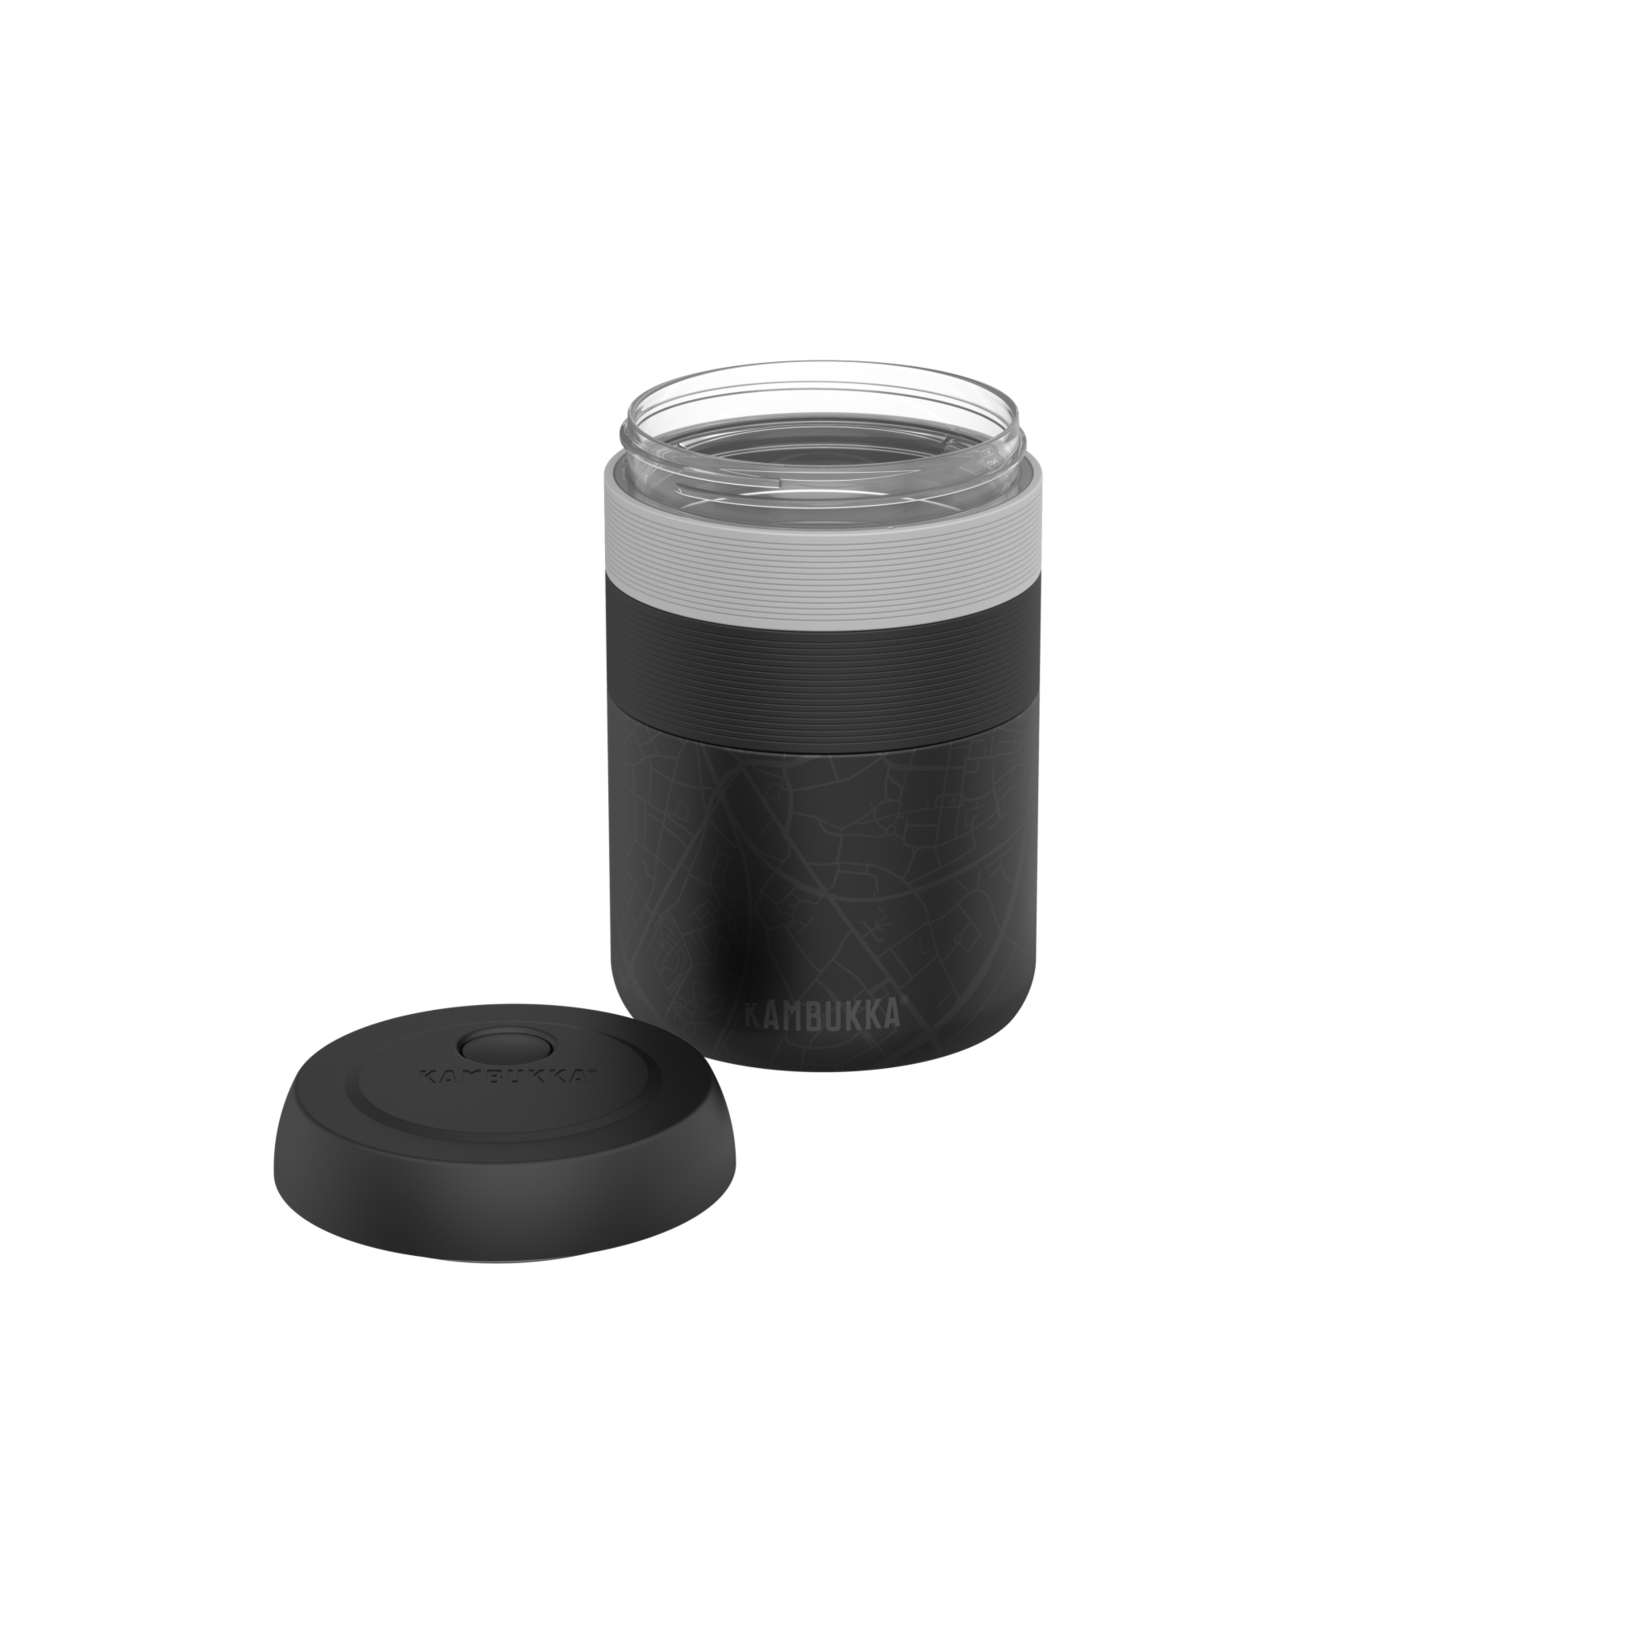 Kambukka Bora Microgolf Compartiment